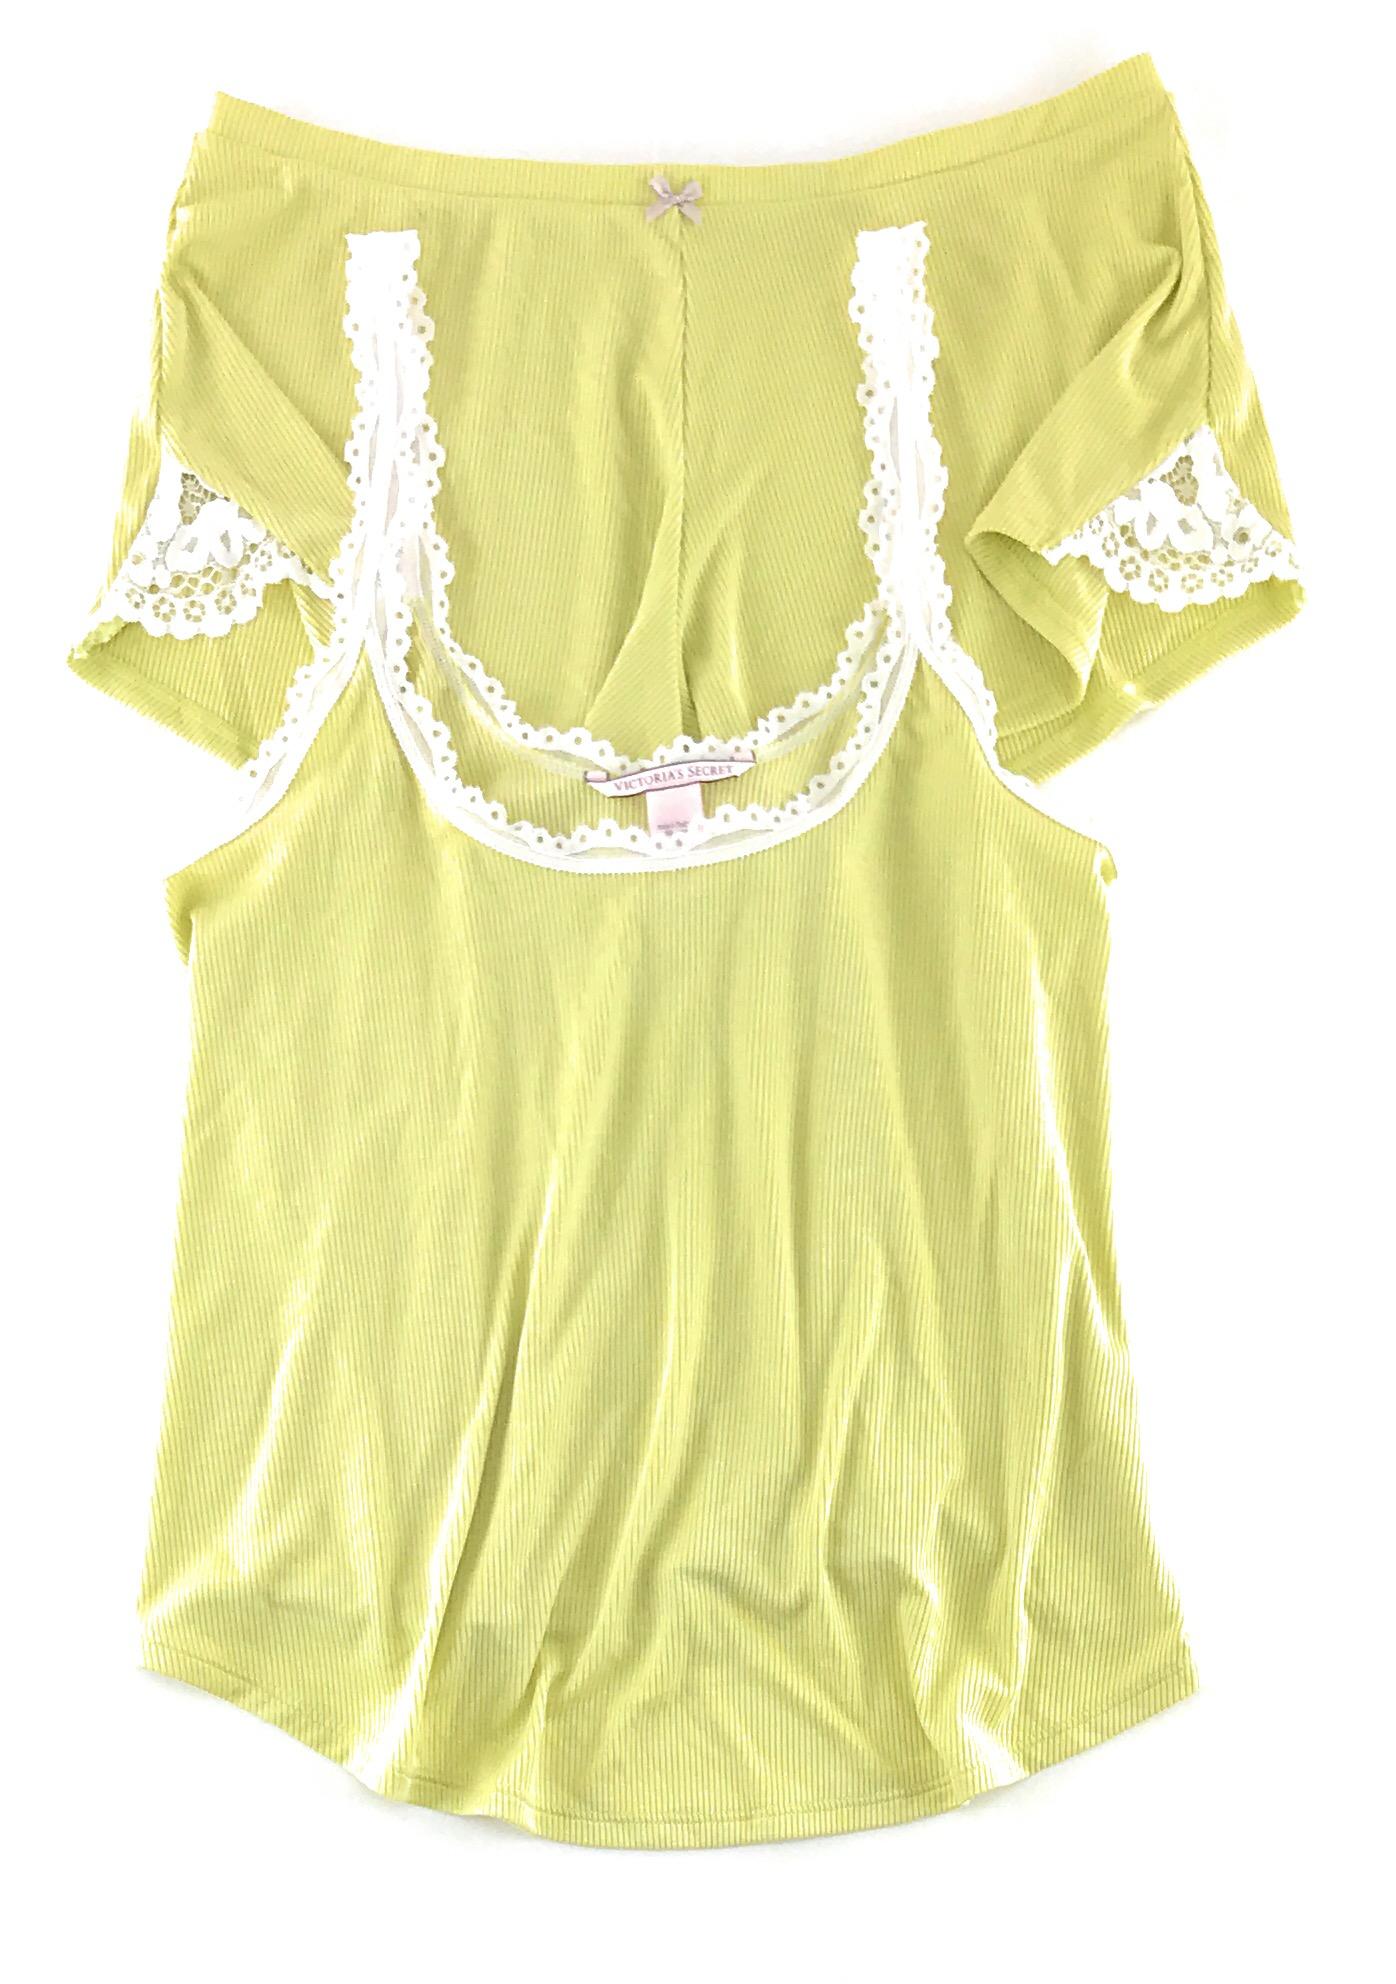 Victoria-039-s-Secret-Pajamas-Set-PJs-2-Piece-Ribbed-Sleep-Cami-Tank-and-Shorts thumbnail 8